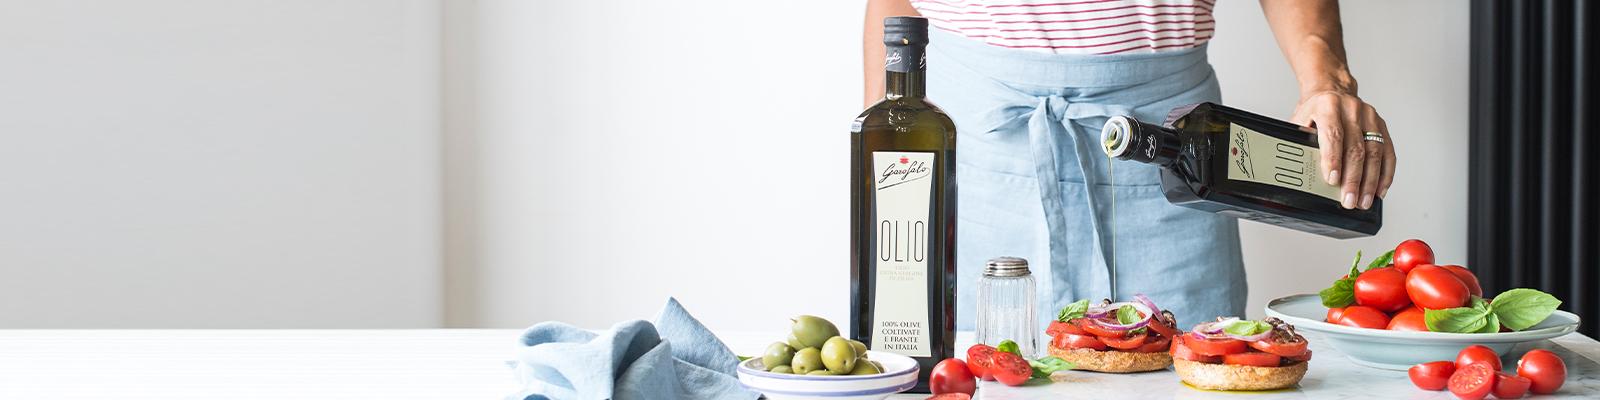 Pasta Garofalo - Extravergine Olivenöl 750ml